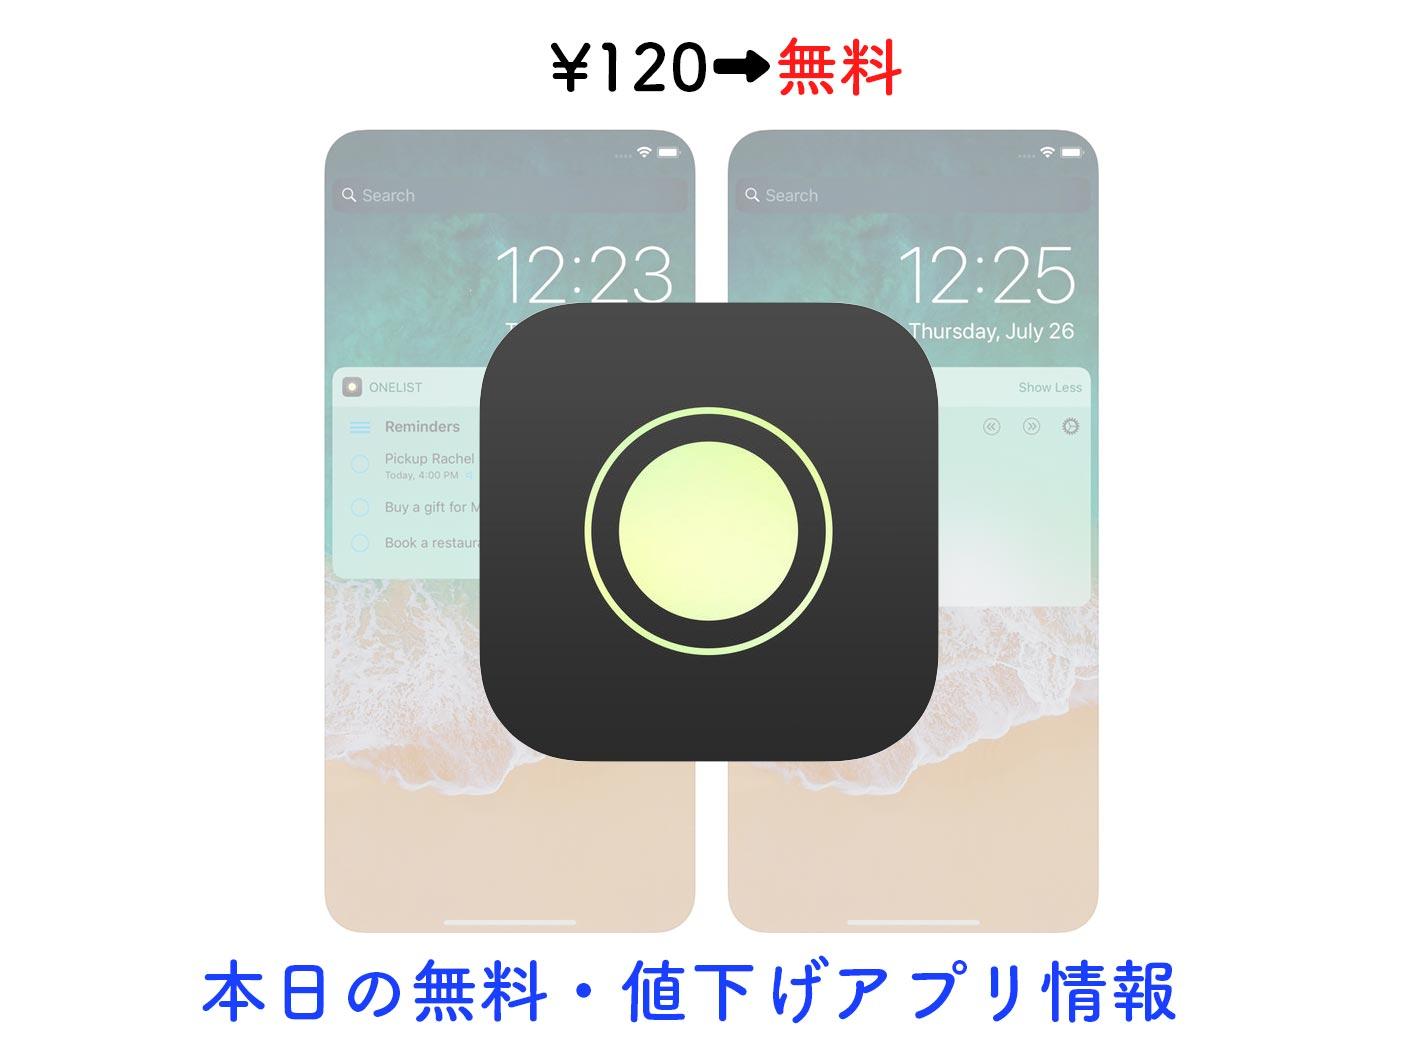 Appsale0809